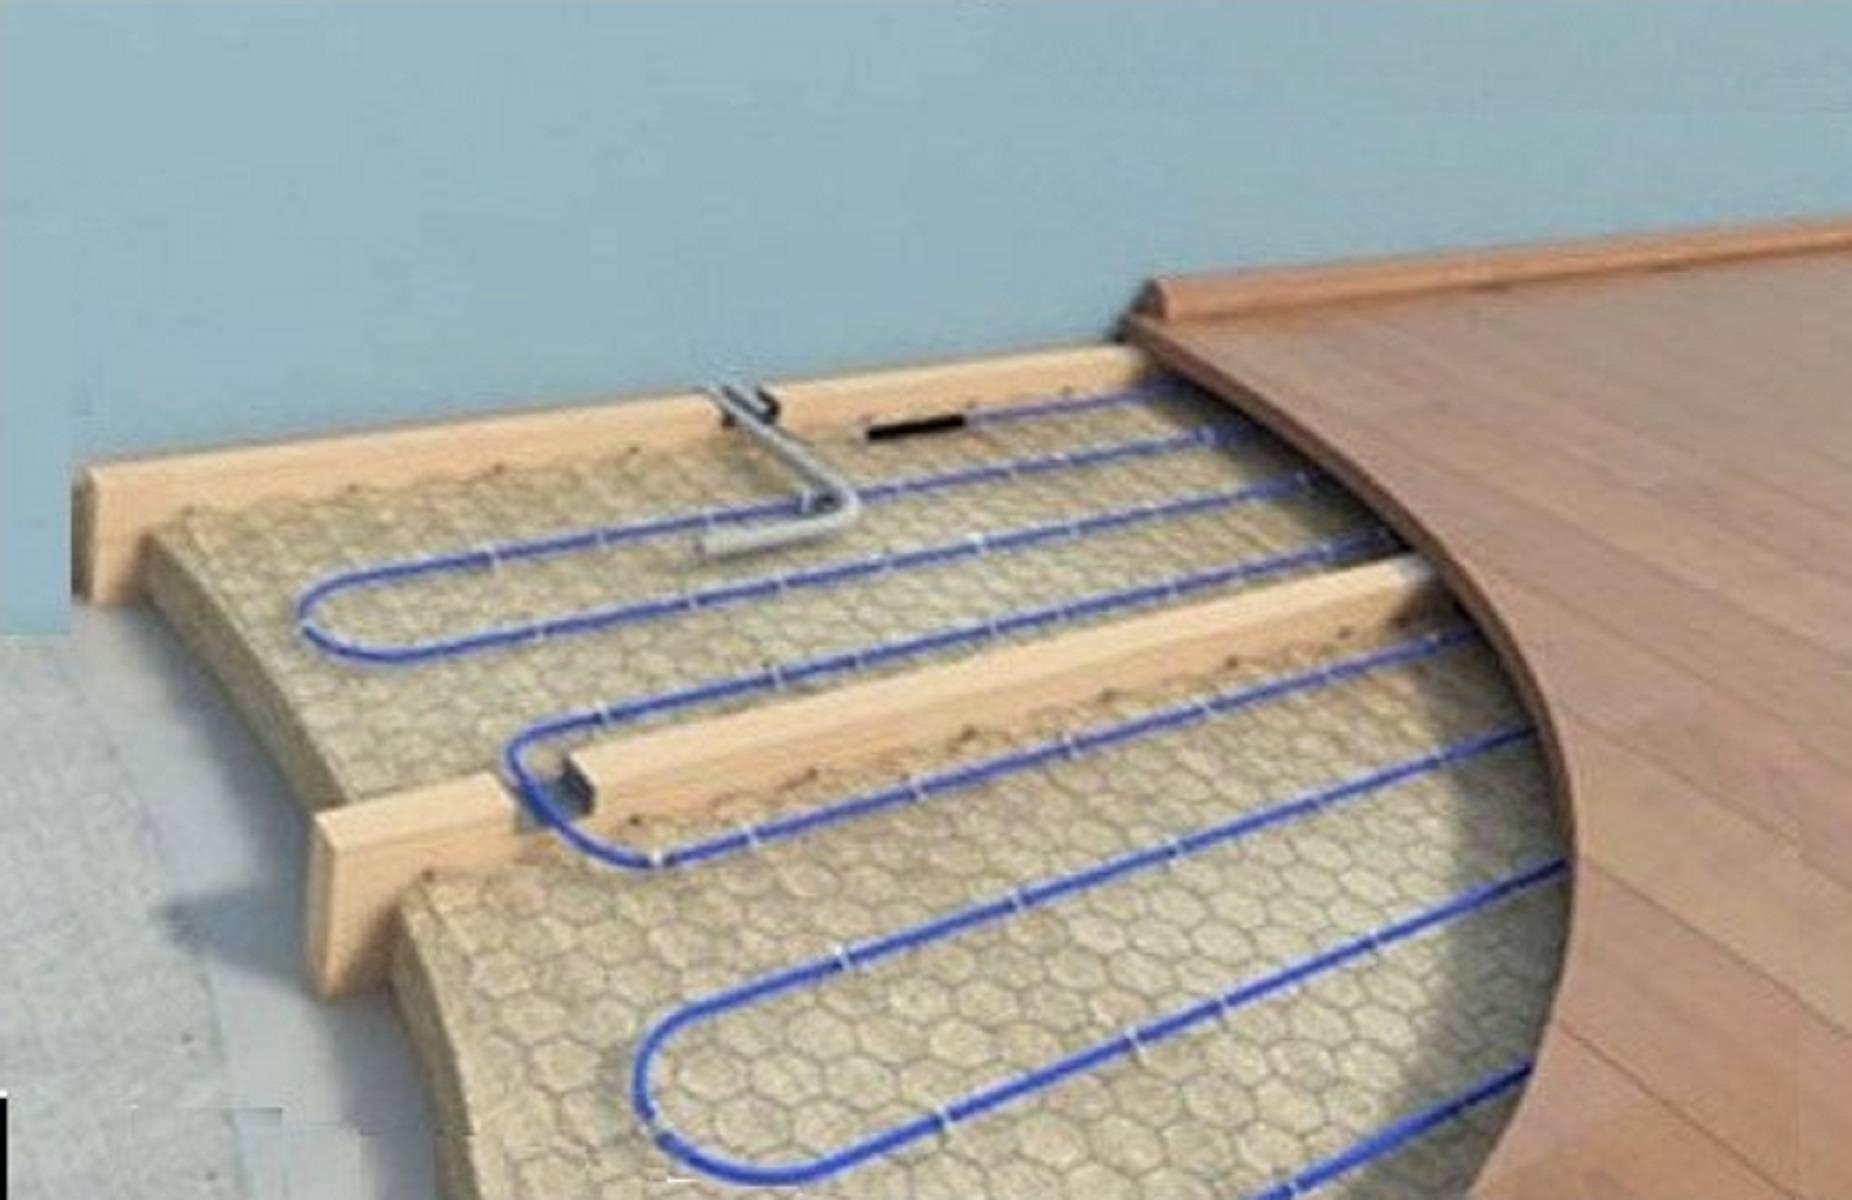 Электрический теплый пол под ламинат, плитку, фото-отчеты + видео